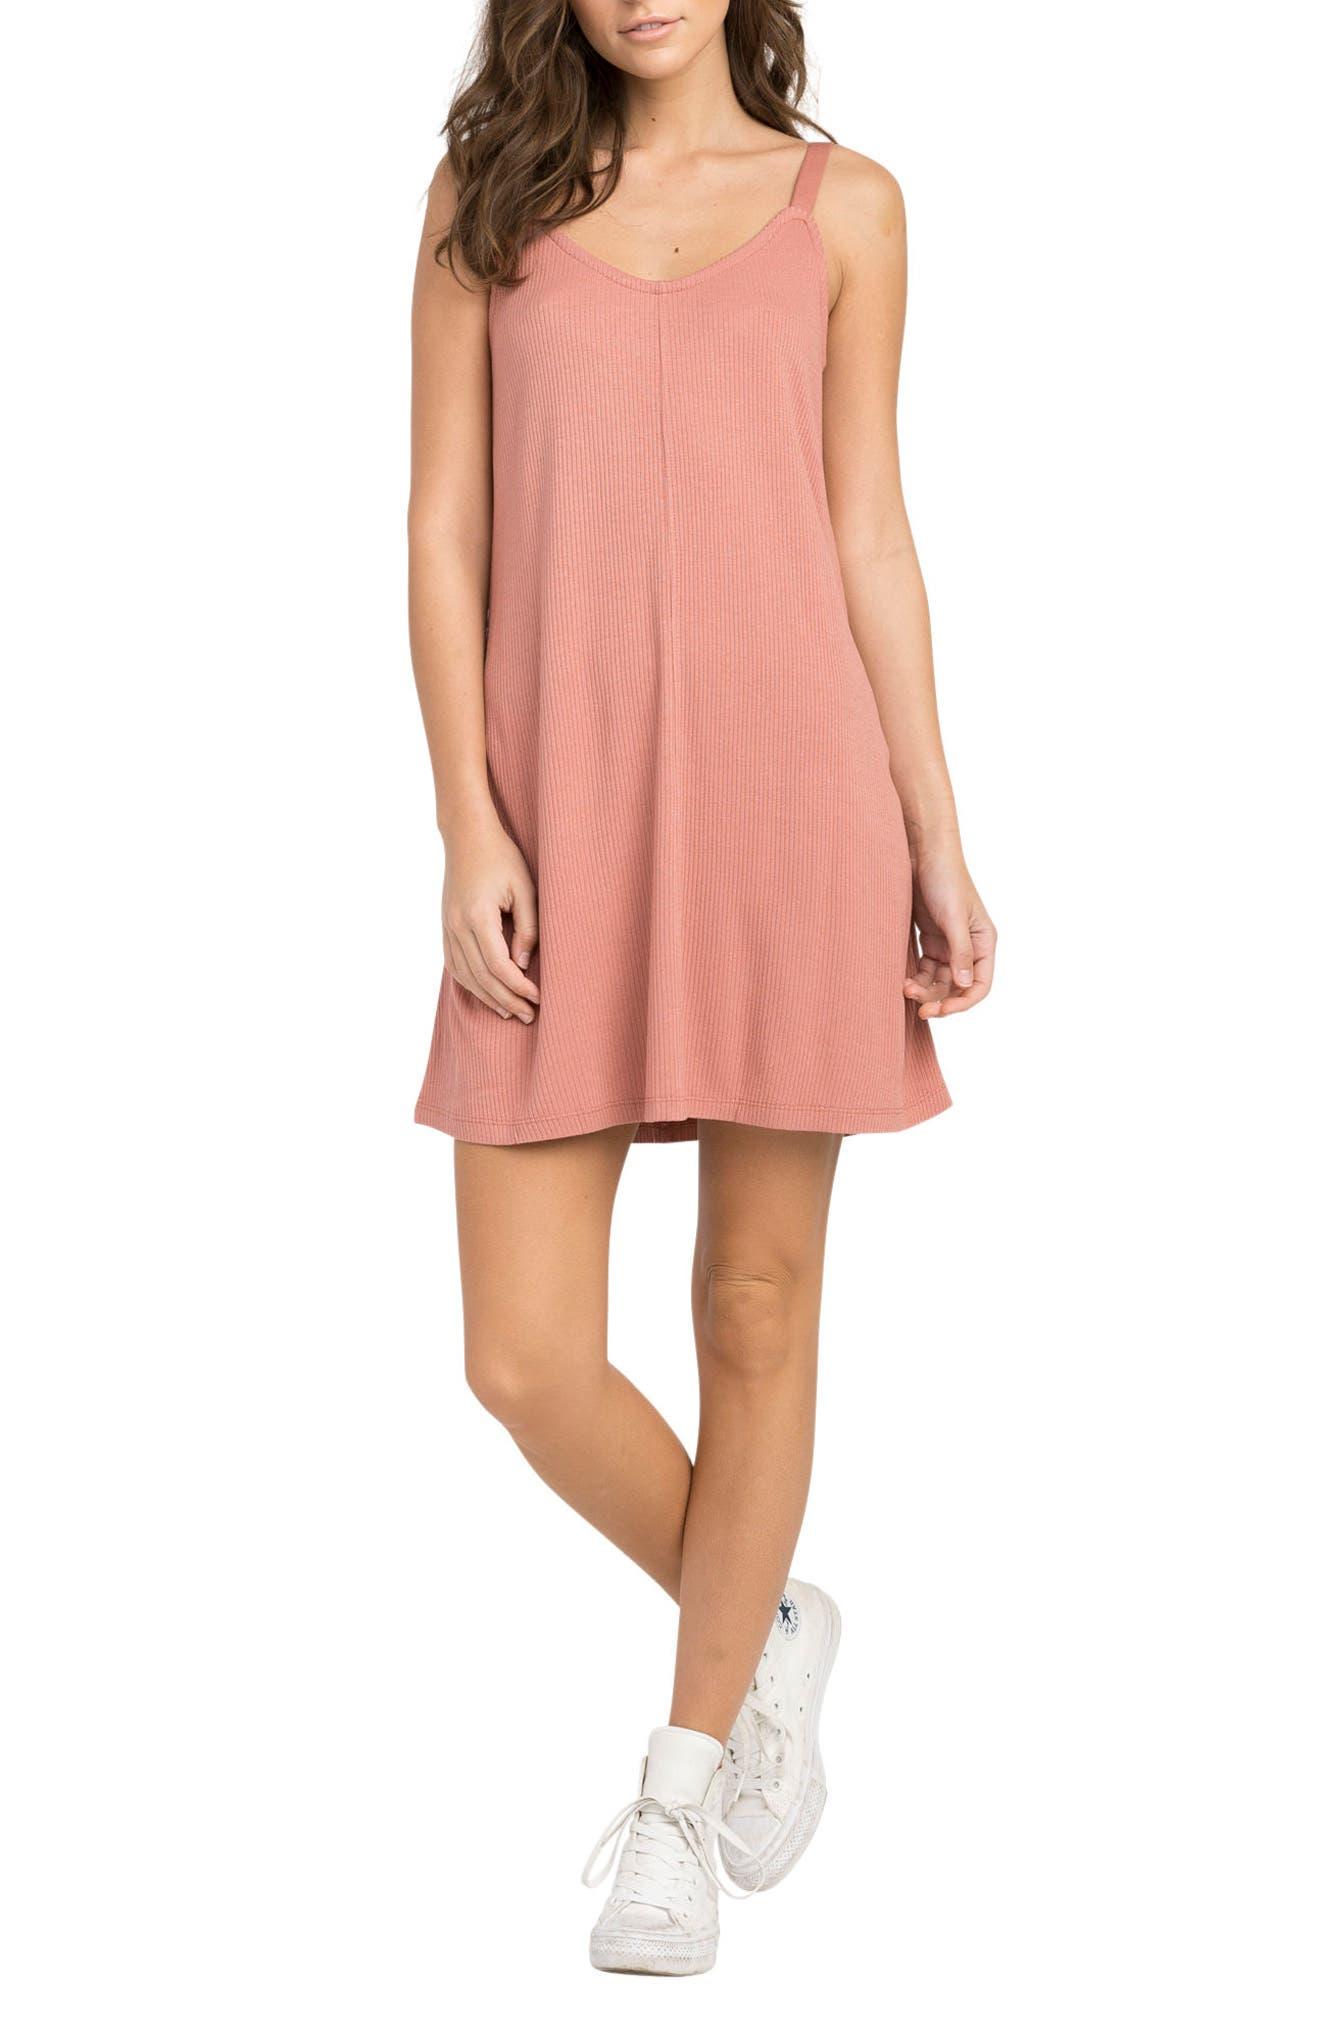 Switchback Rib Knit Dress,                         Main,                         color, Mahogany